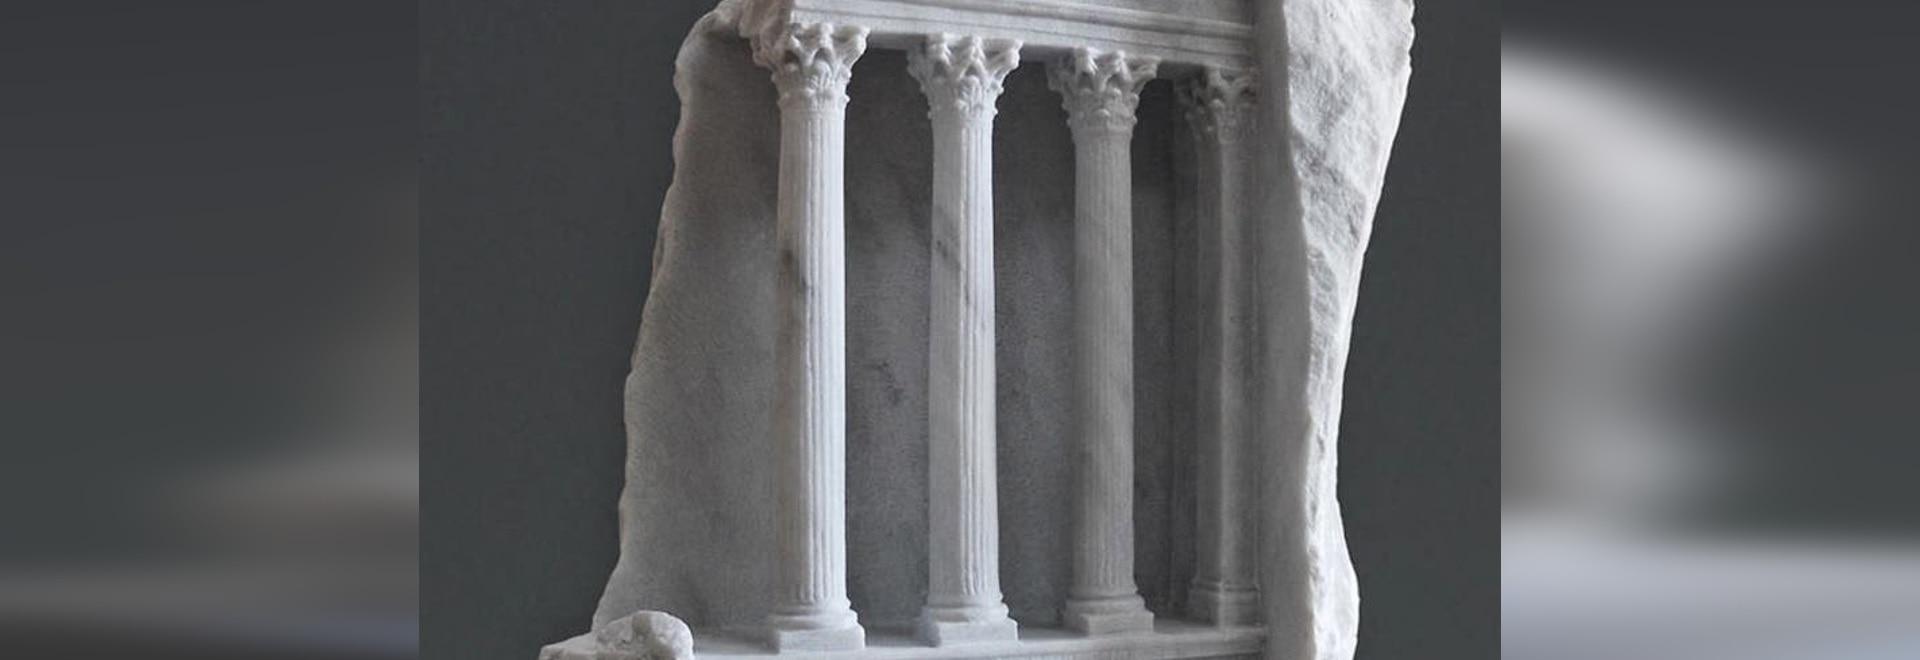 Sculptor Matthew Simmonds Carves Realistic Interiors Into